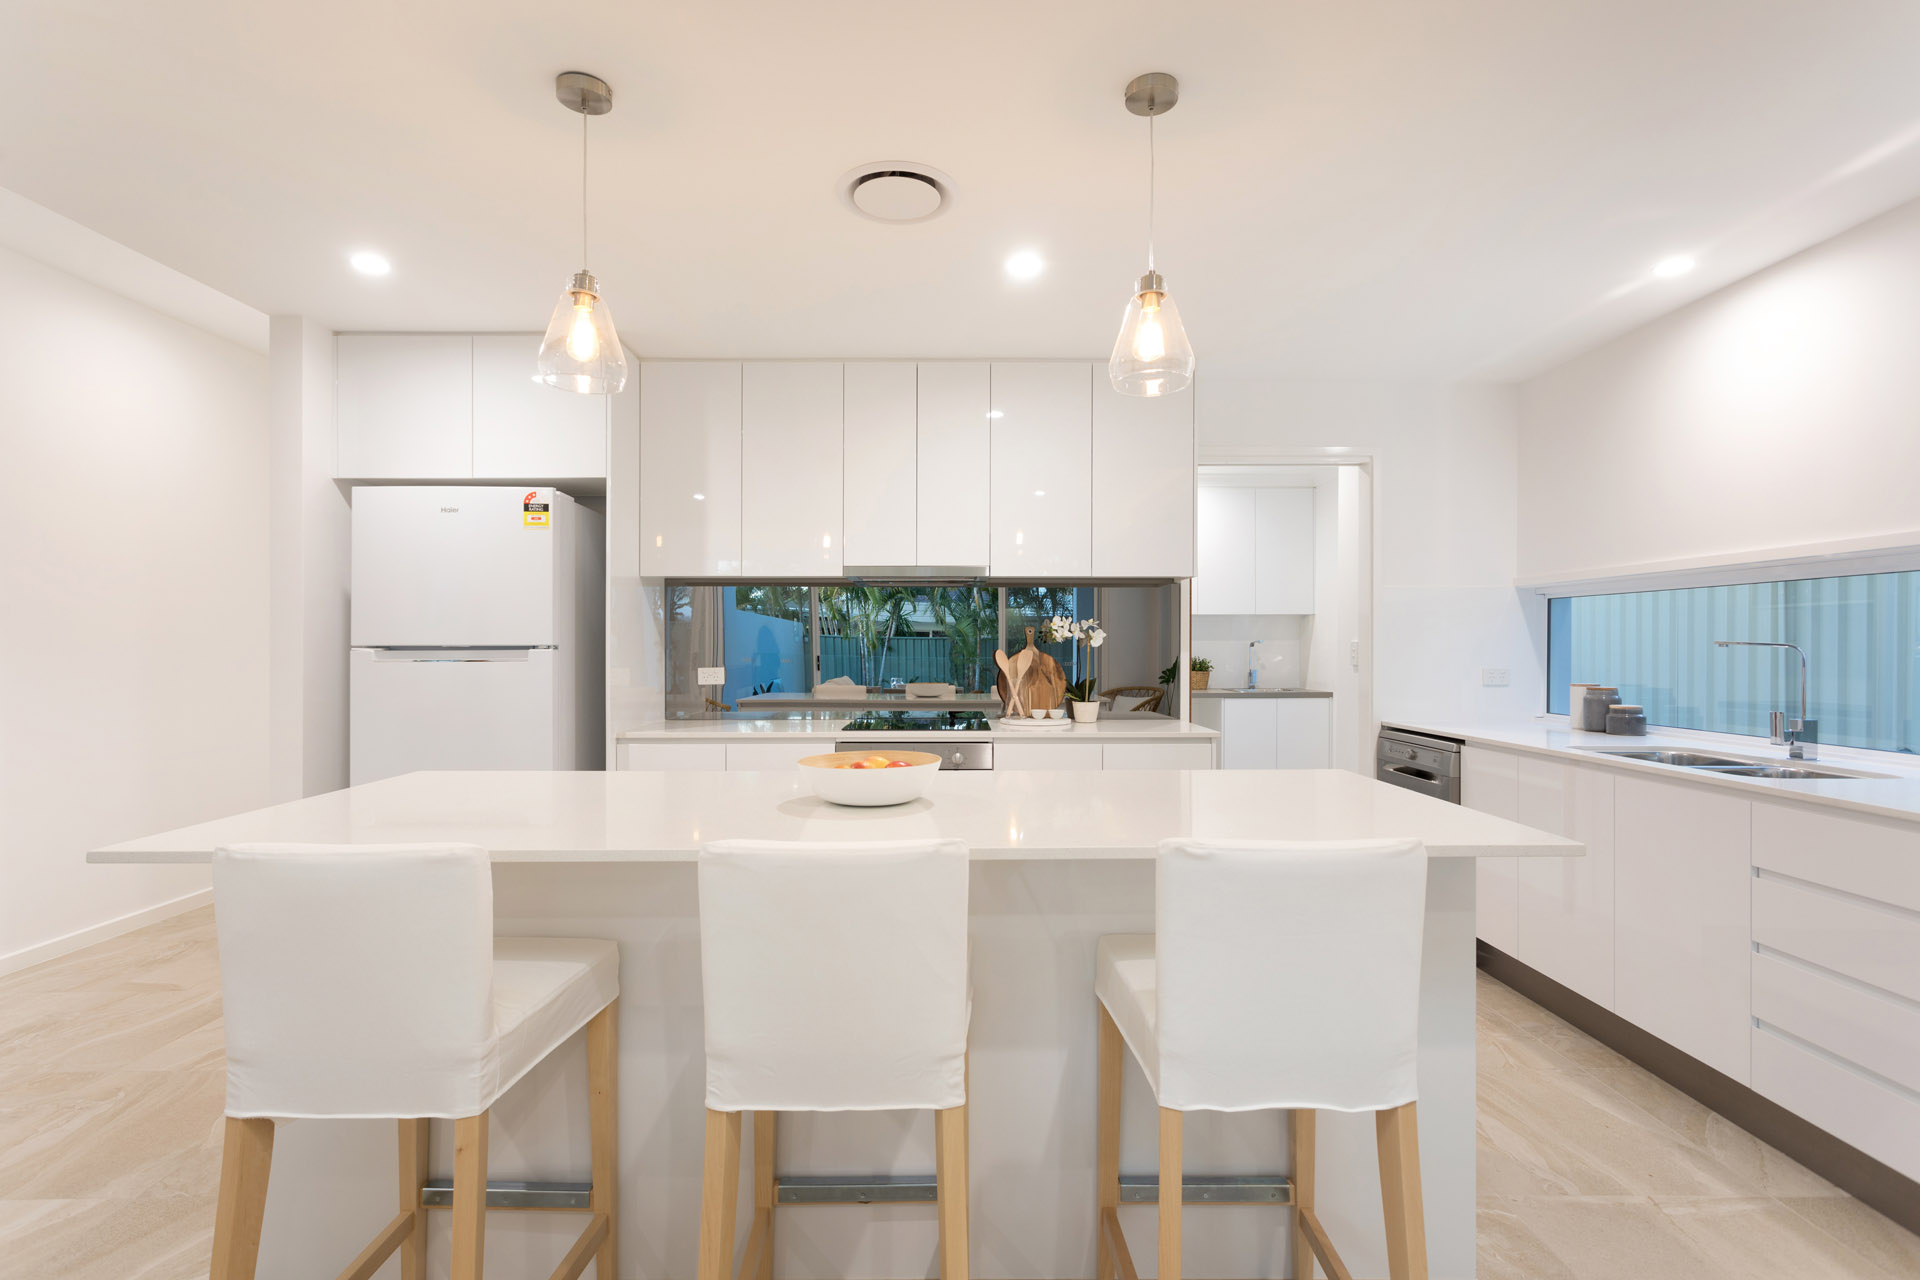 Real Estate | Gold Coast | Chevron Realty | 20180822 0b4a7042